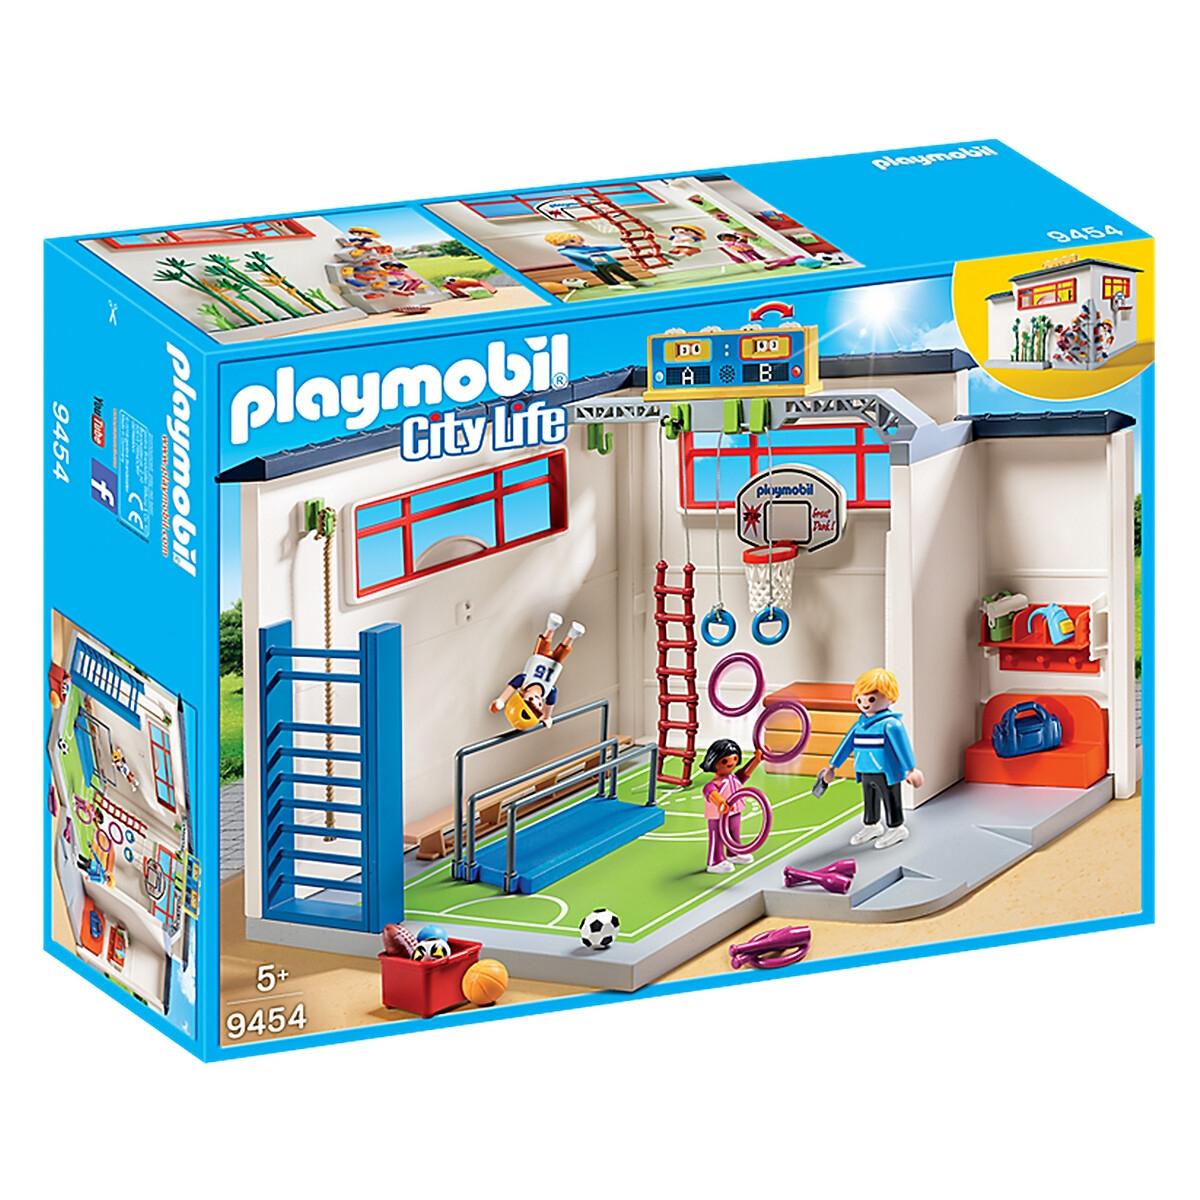 An image of Playmobil Sports Hall, 9454